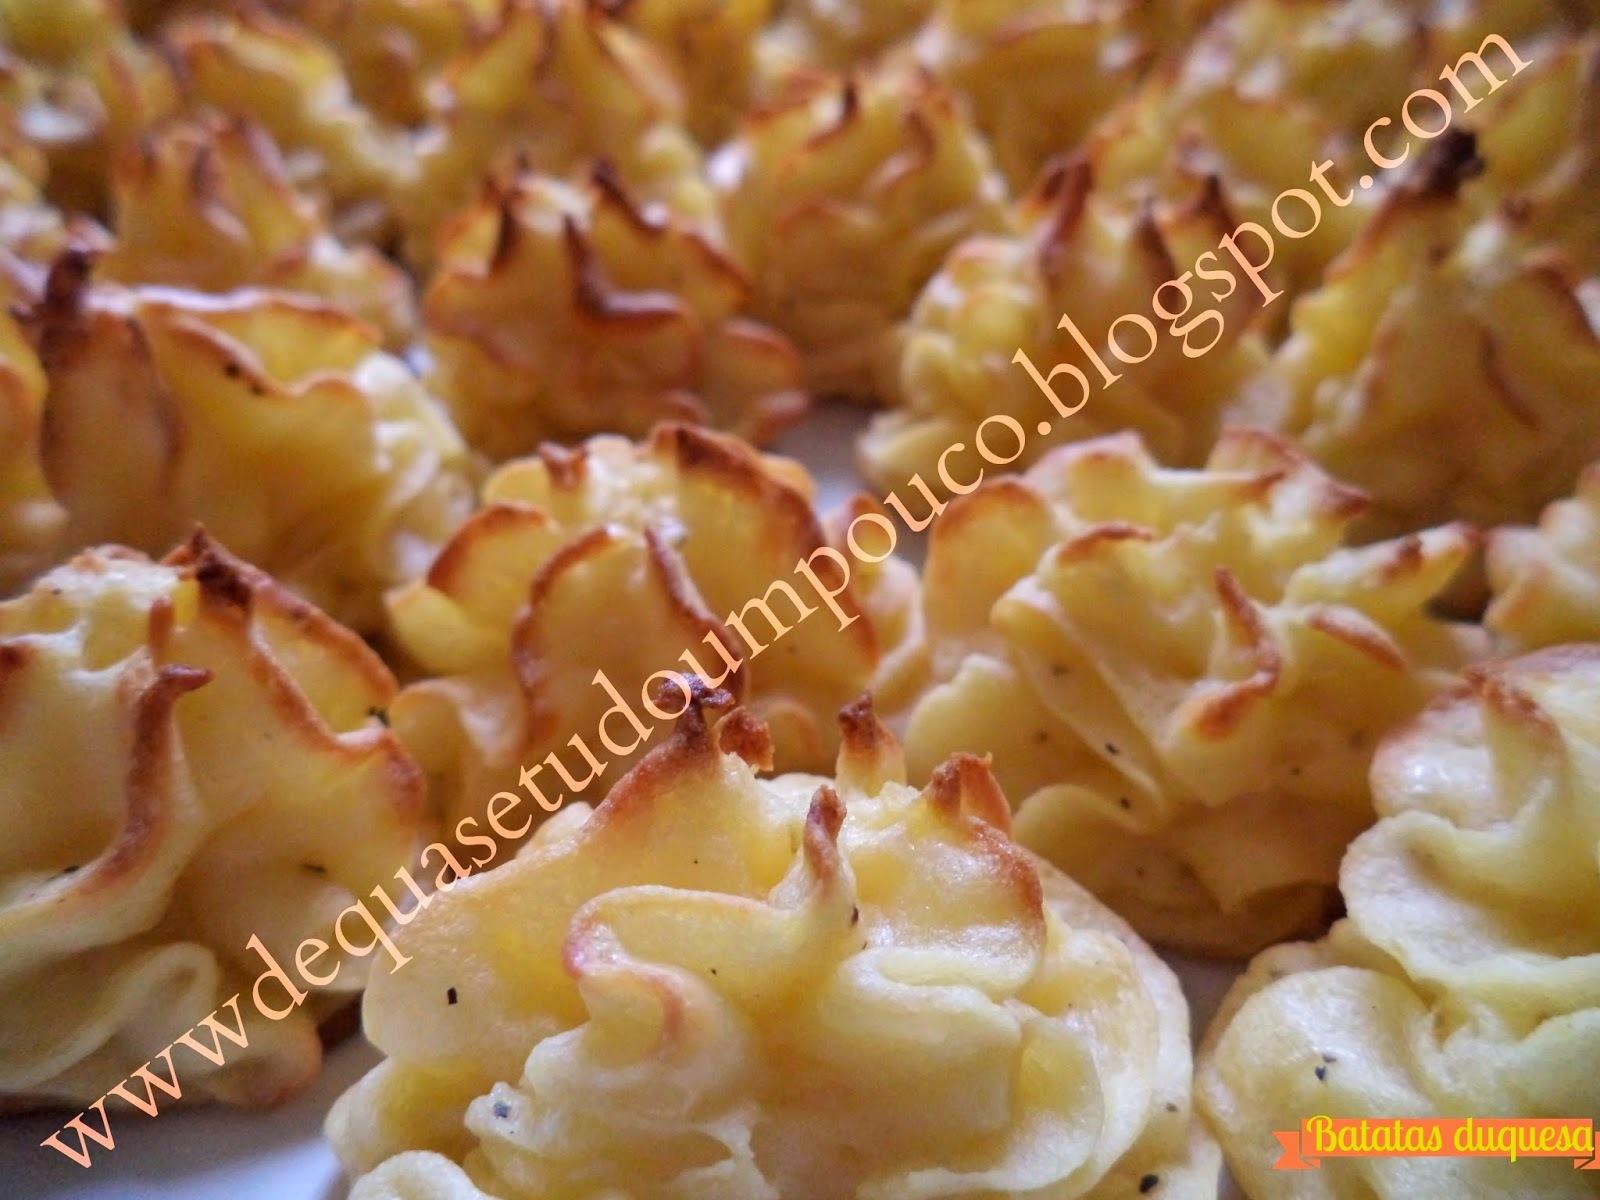 de pao de queijo com batata baroa